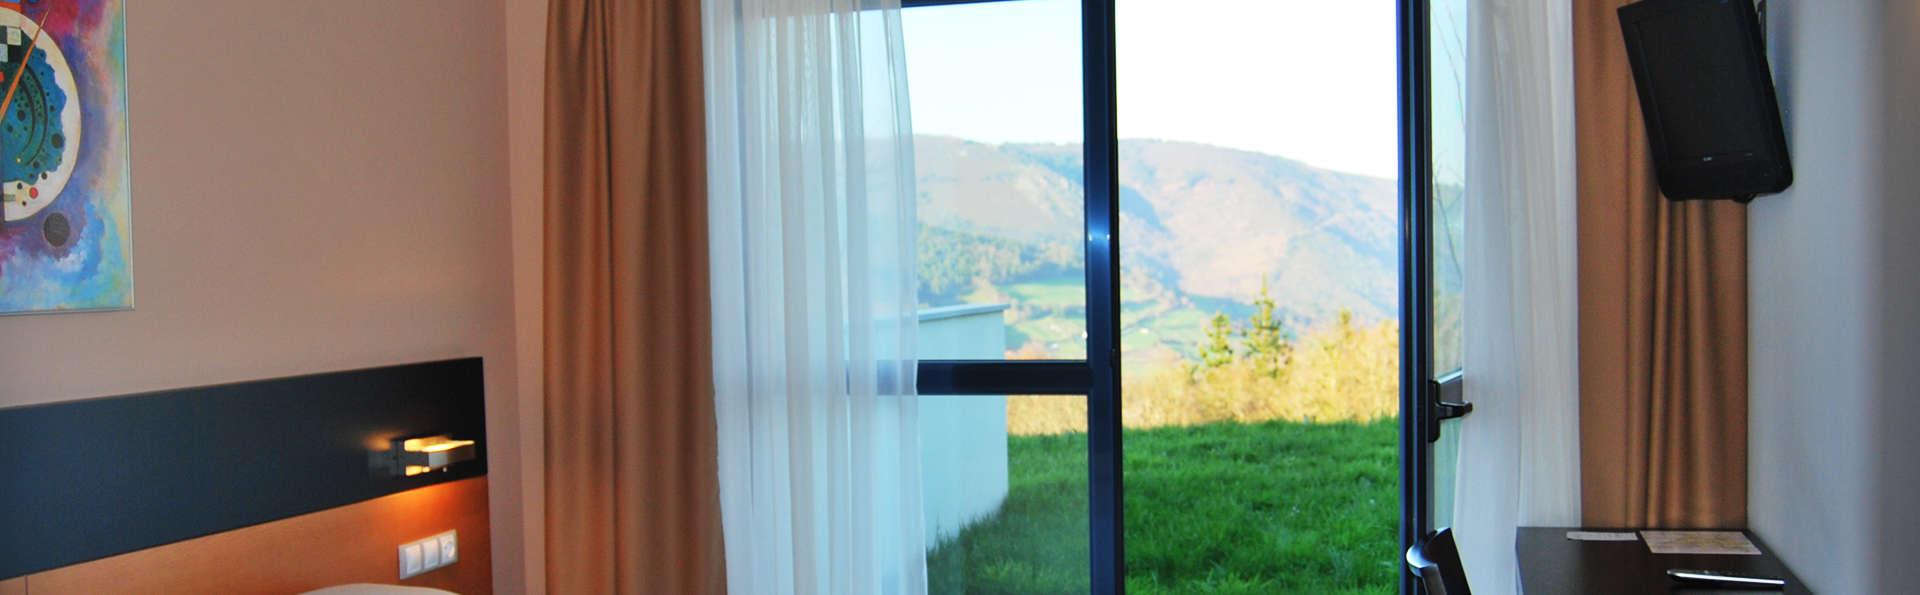 Hotel Parrilla El Zangano - EDIT_room1.jpg